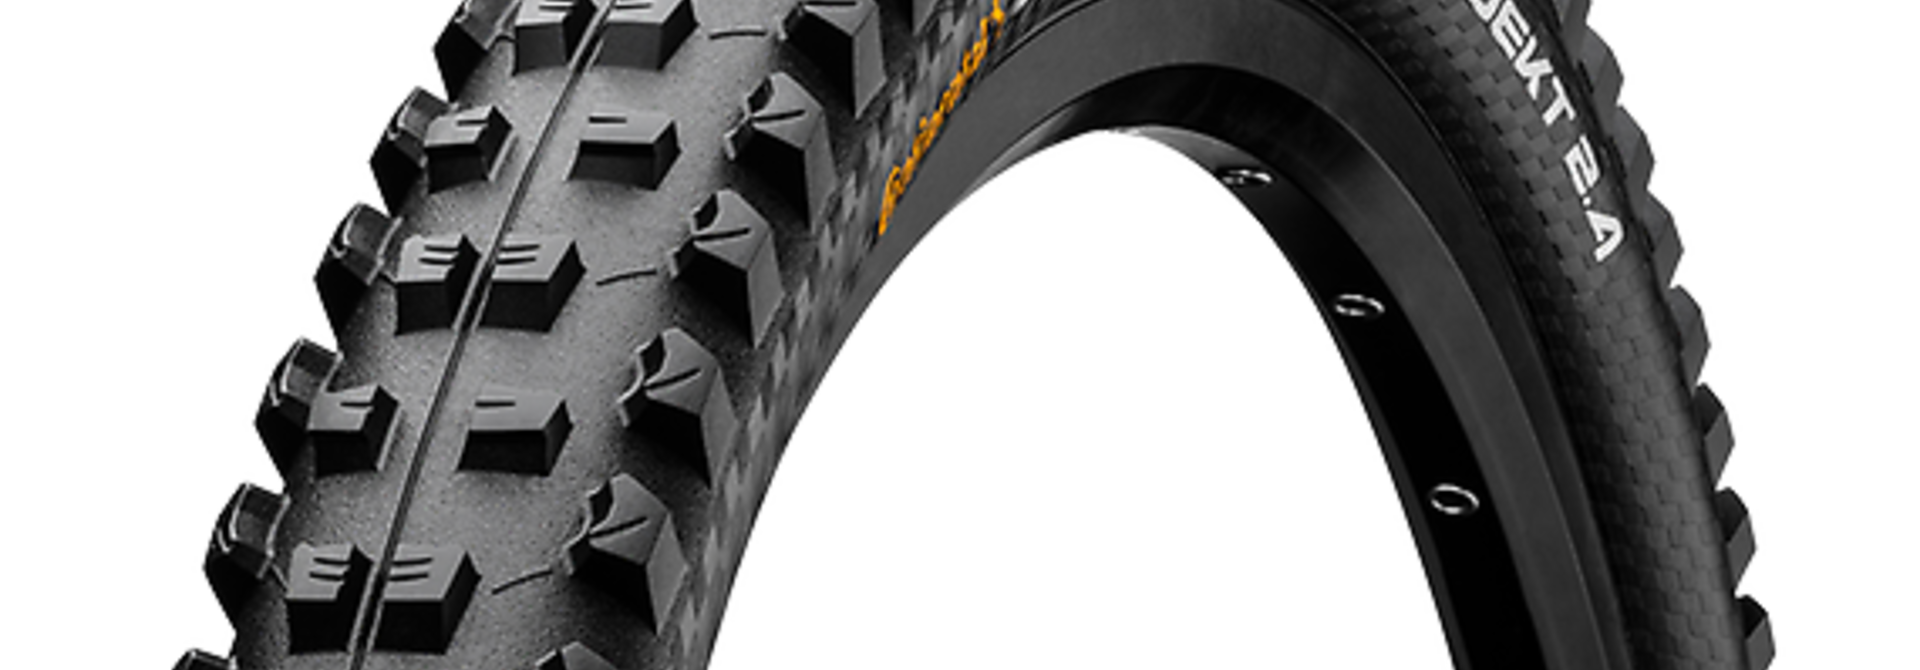 Continental Der Baron Projekt Tire 29' x 2.40 Folding ProTection APEX + Black Chili